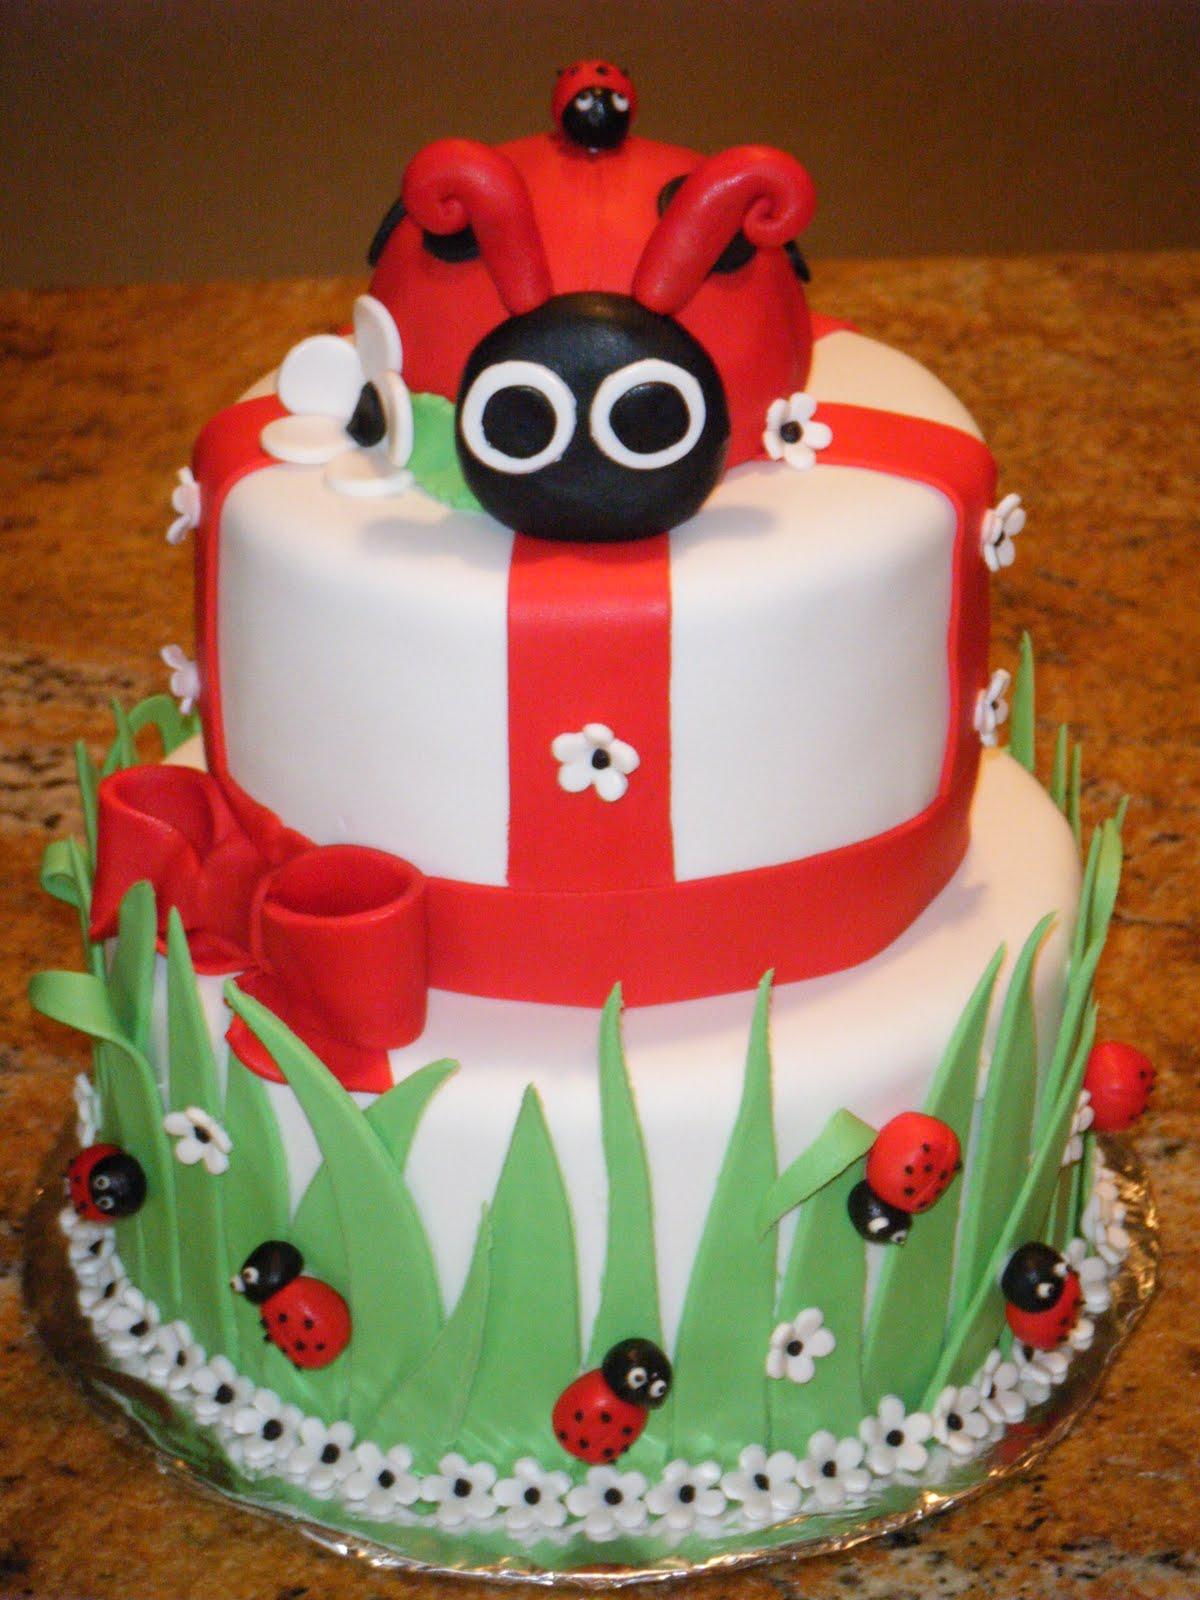 Ladybug Cake Design